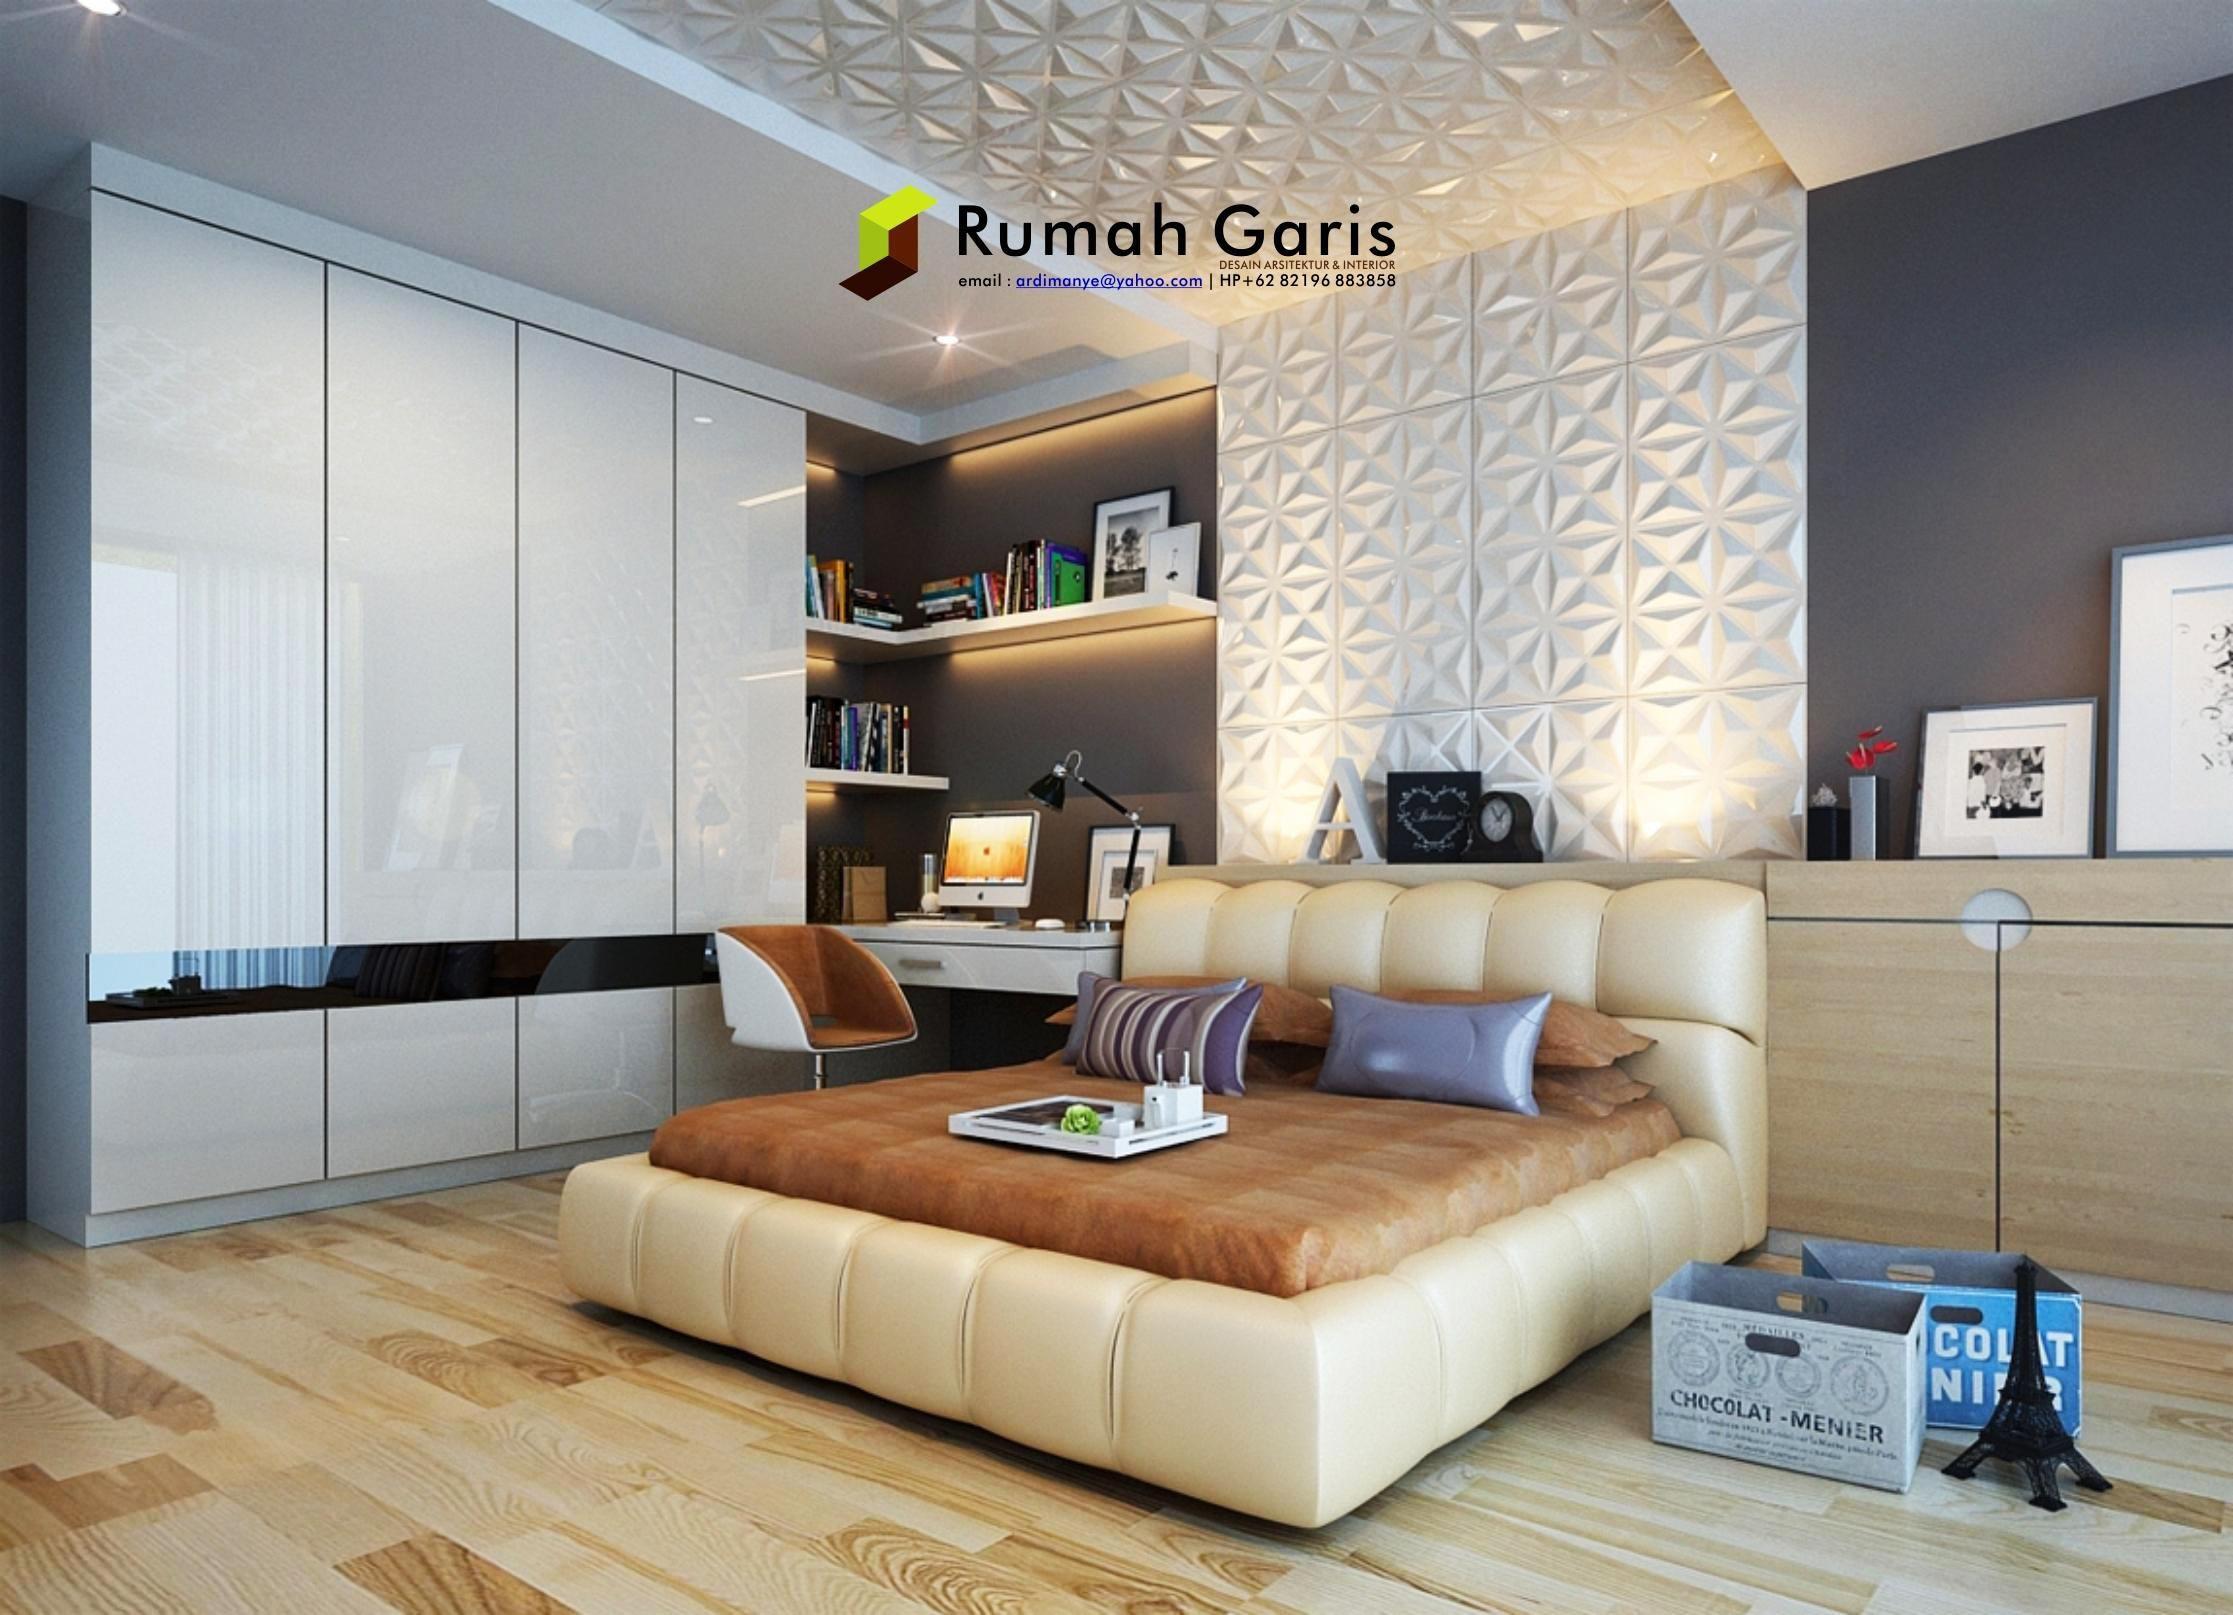 Design interior kamar minimalis - Desain Interior Makassar Kamar Tidur Anak Remaja 3d Render By Rumah Garis Studio Arsitektur Interior